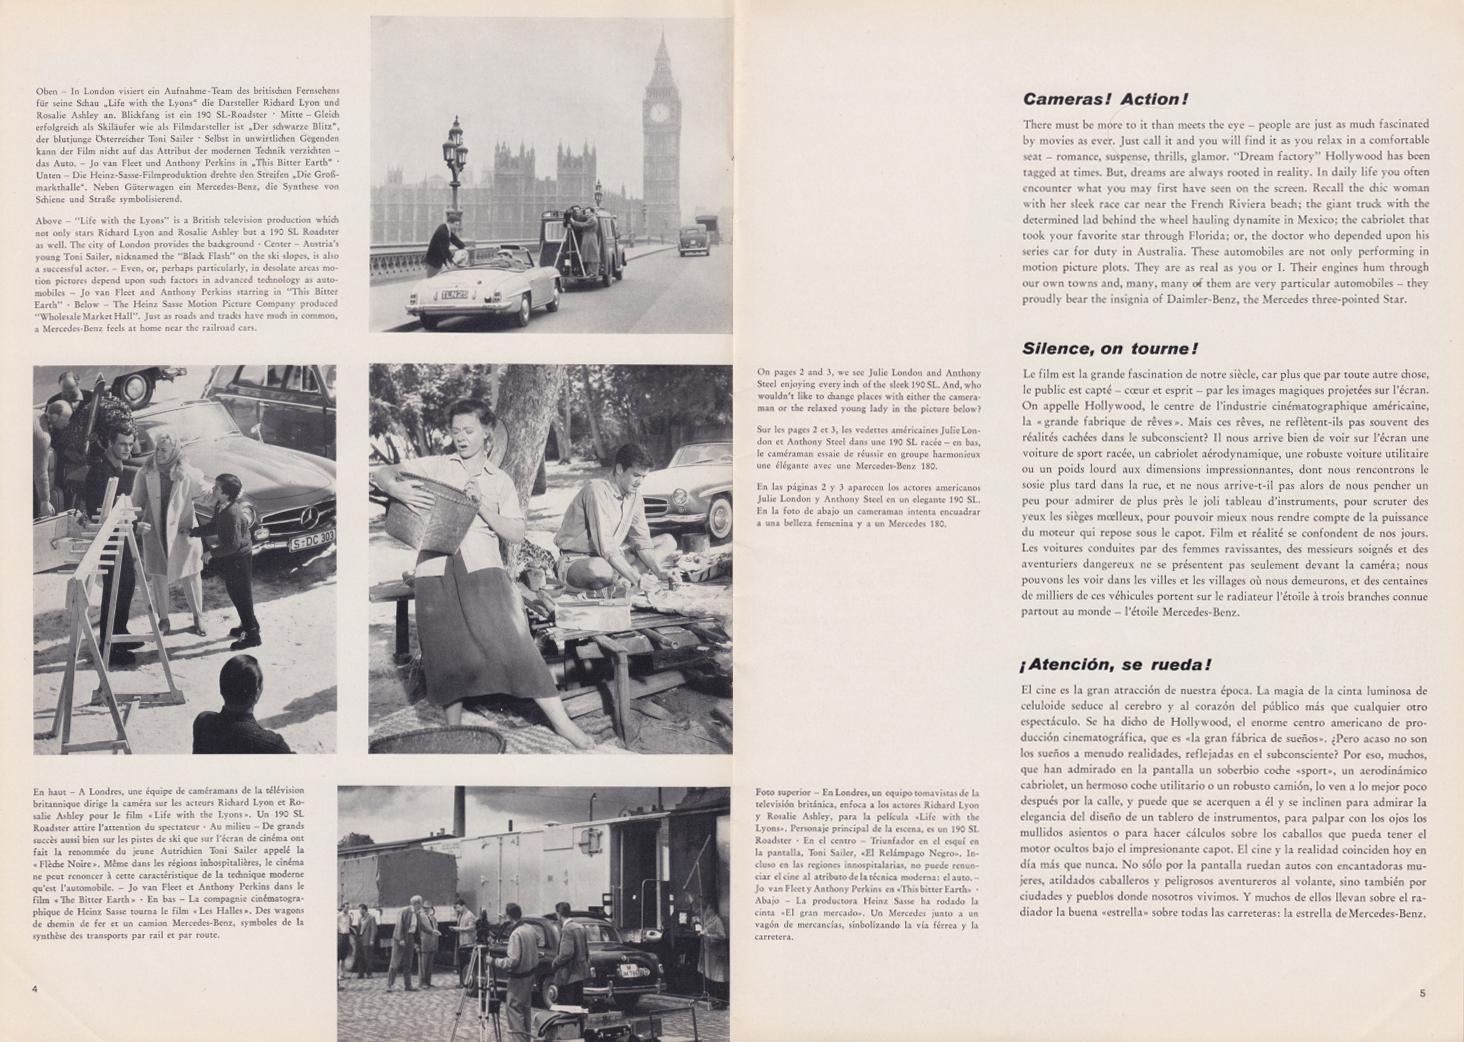 (REVISTA): Periódico In aller welt n.º 30 - Mercedes-Benz no mundo - 1959 - multilingue 003